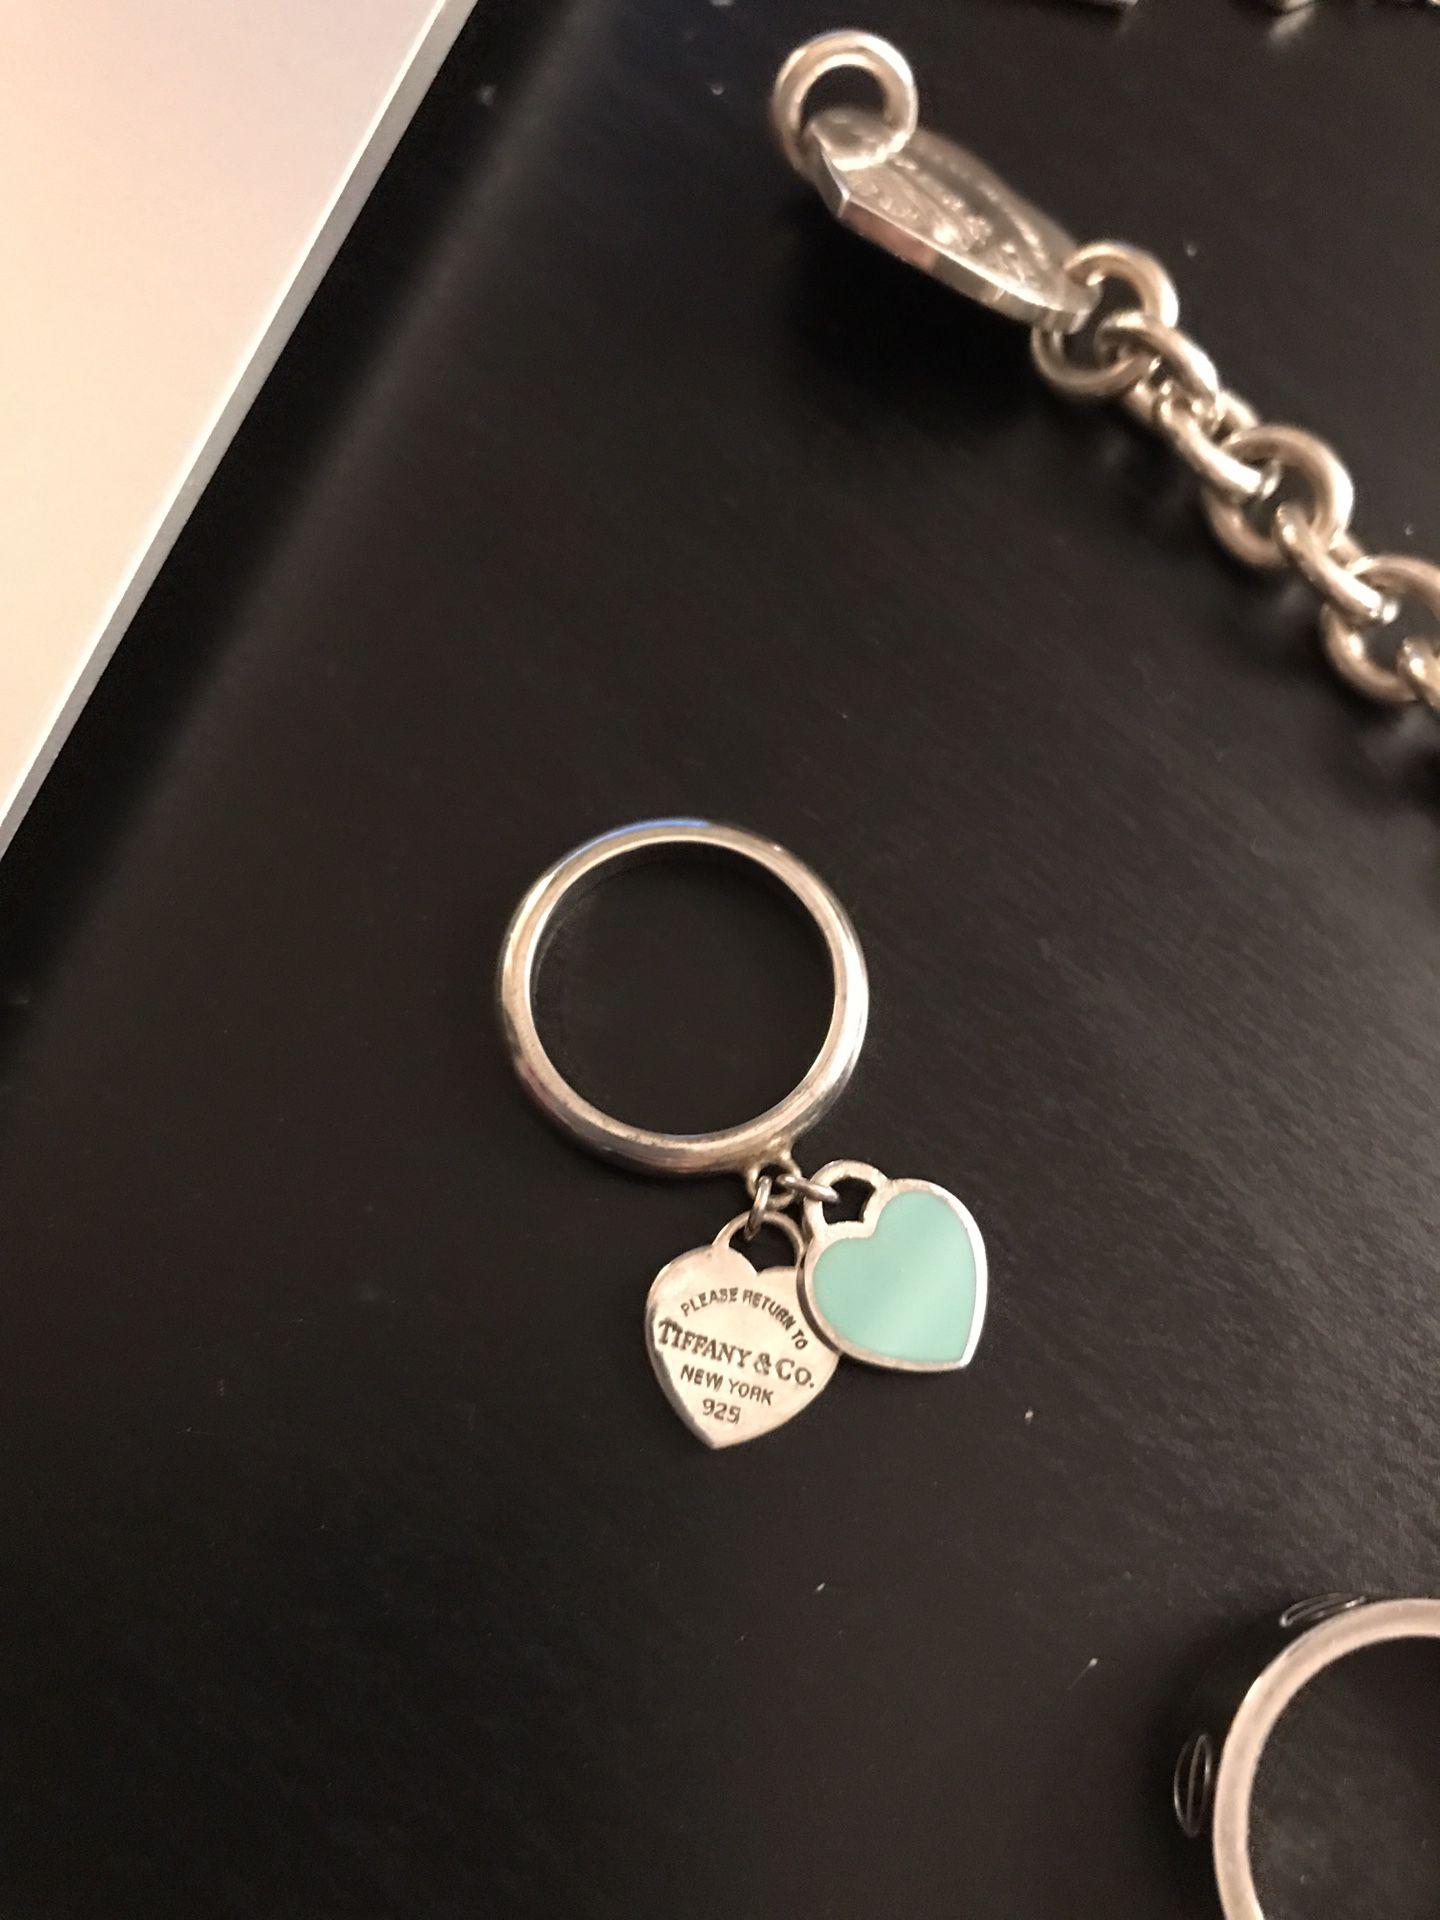 Tiffany & co ring size 6.5